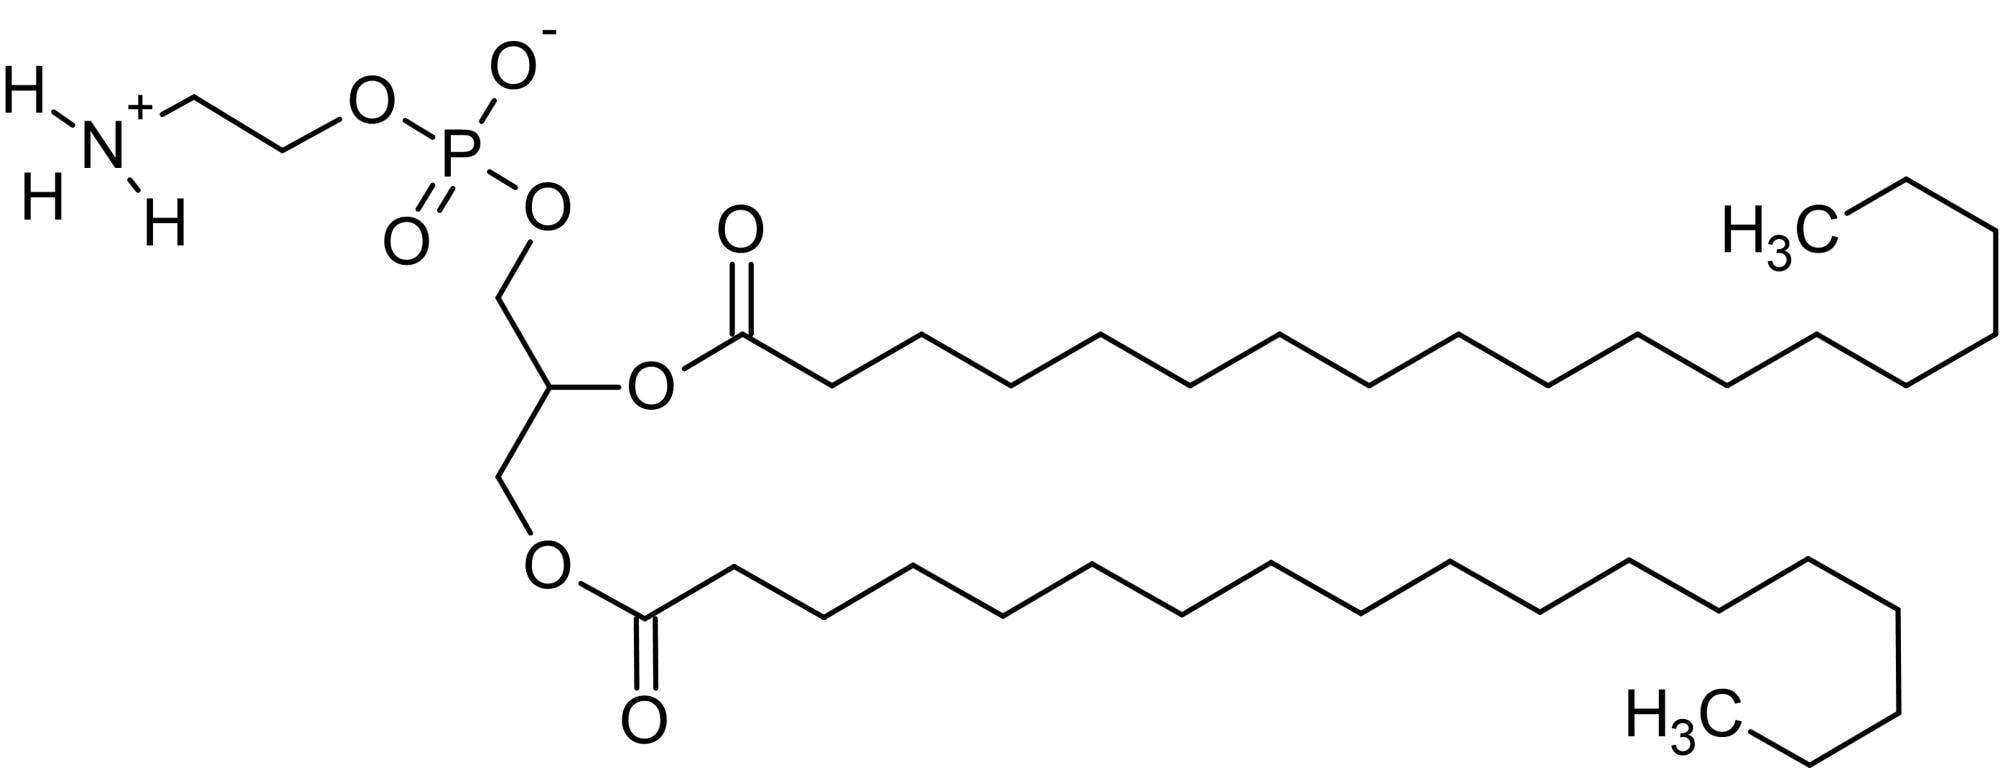 Chemical Structure - 1,2-Distearoyl-sn-glycero-3-phosphorylethanolamine (DSPE), Phosphorylethanolamine phospholipid (ab143957)